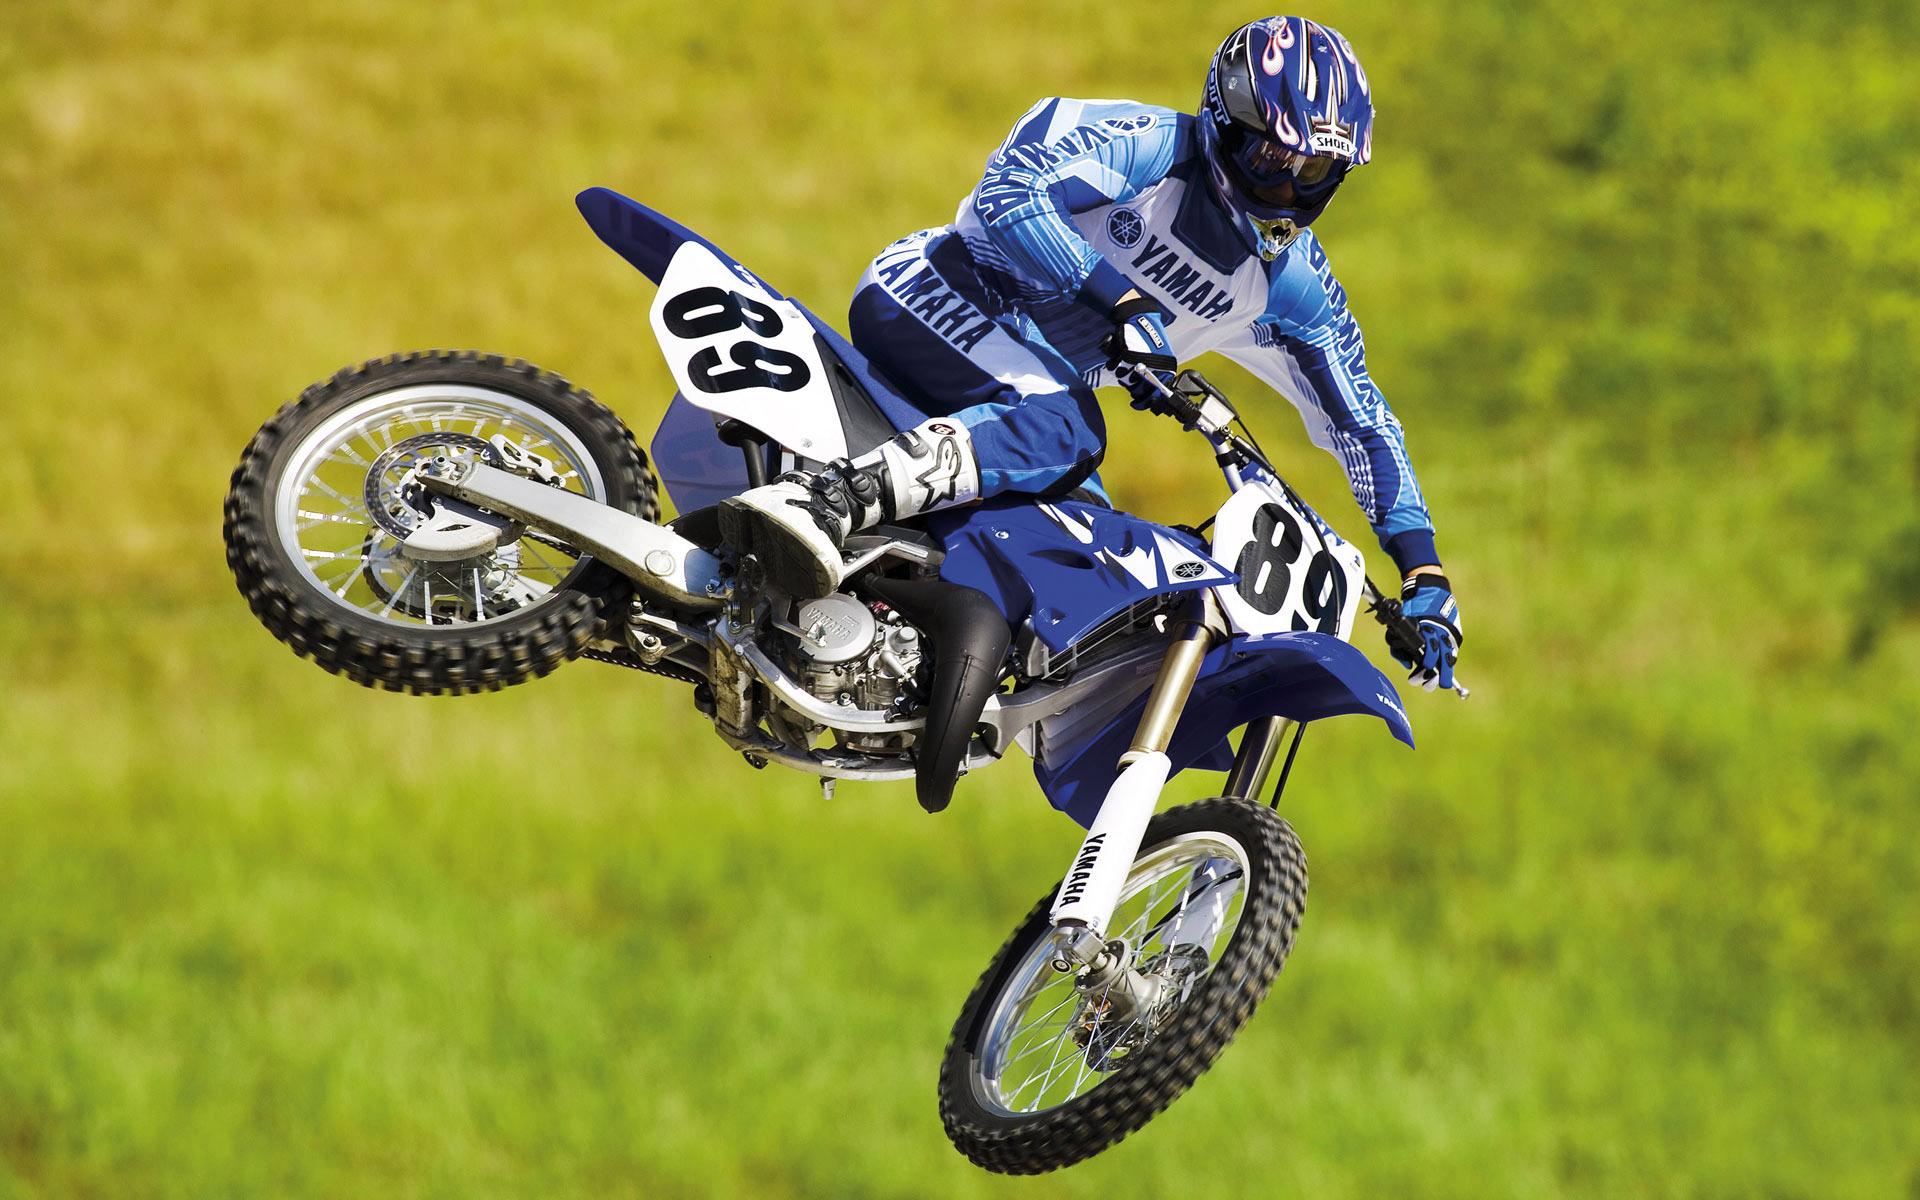 Motocross Yamaha Dirt Bike Wallpaper HD 15 Motorcycle High Resolution 1920x1200